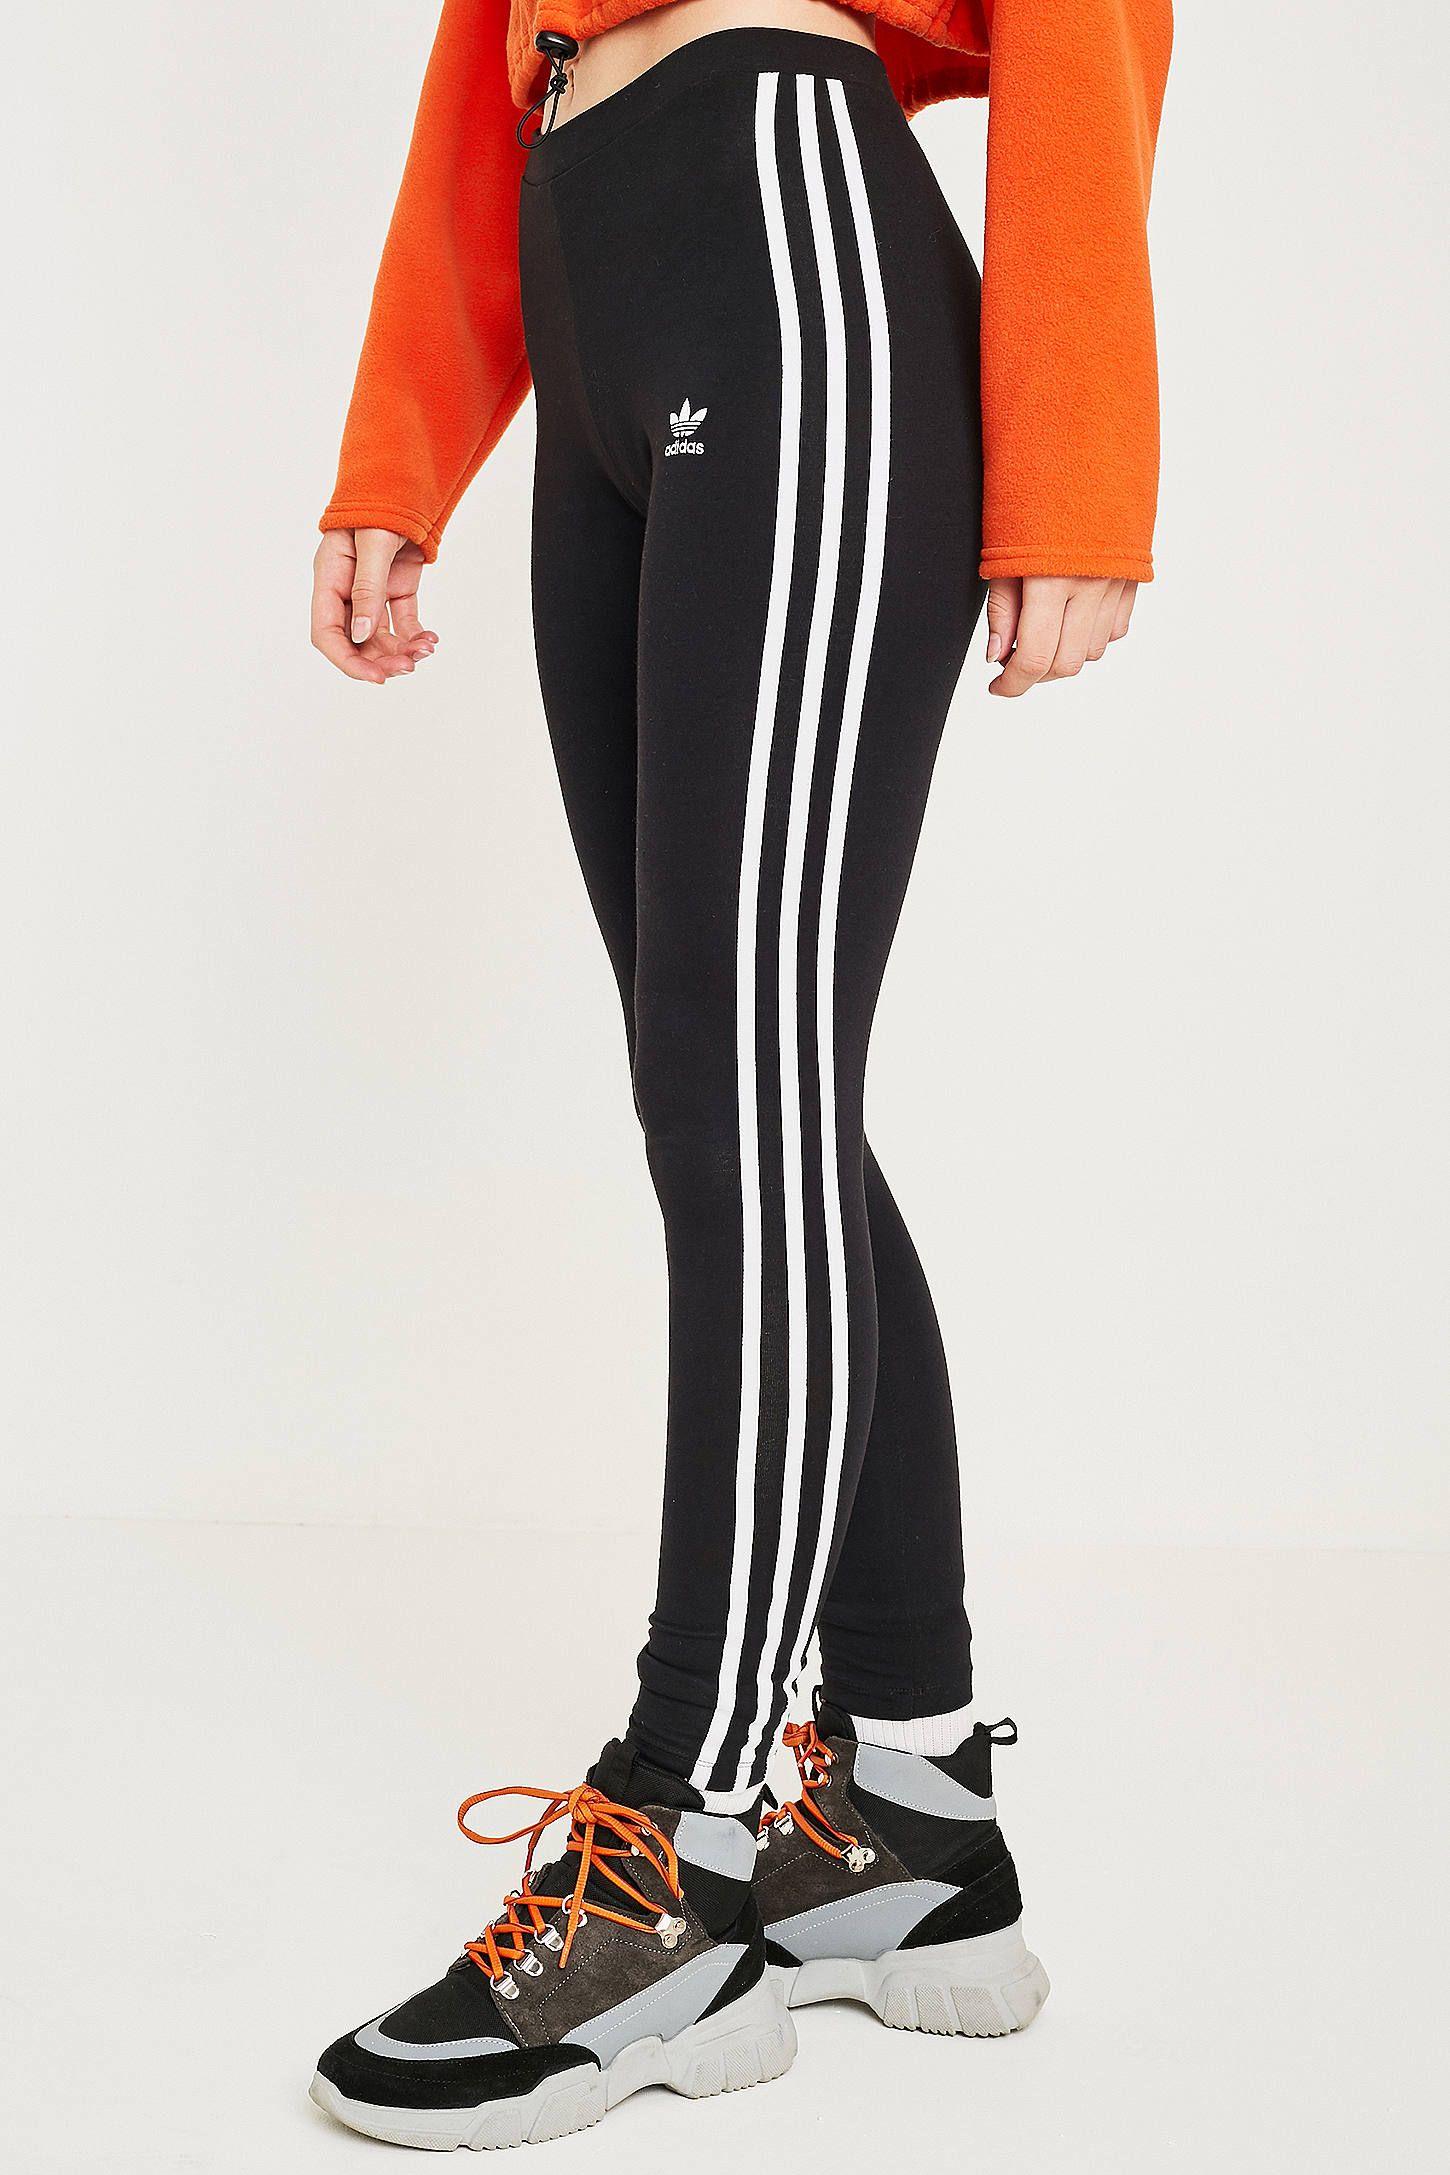 adidas 3 Stripes Leggings Black | adidas UK